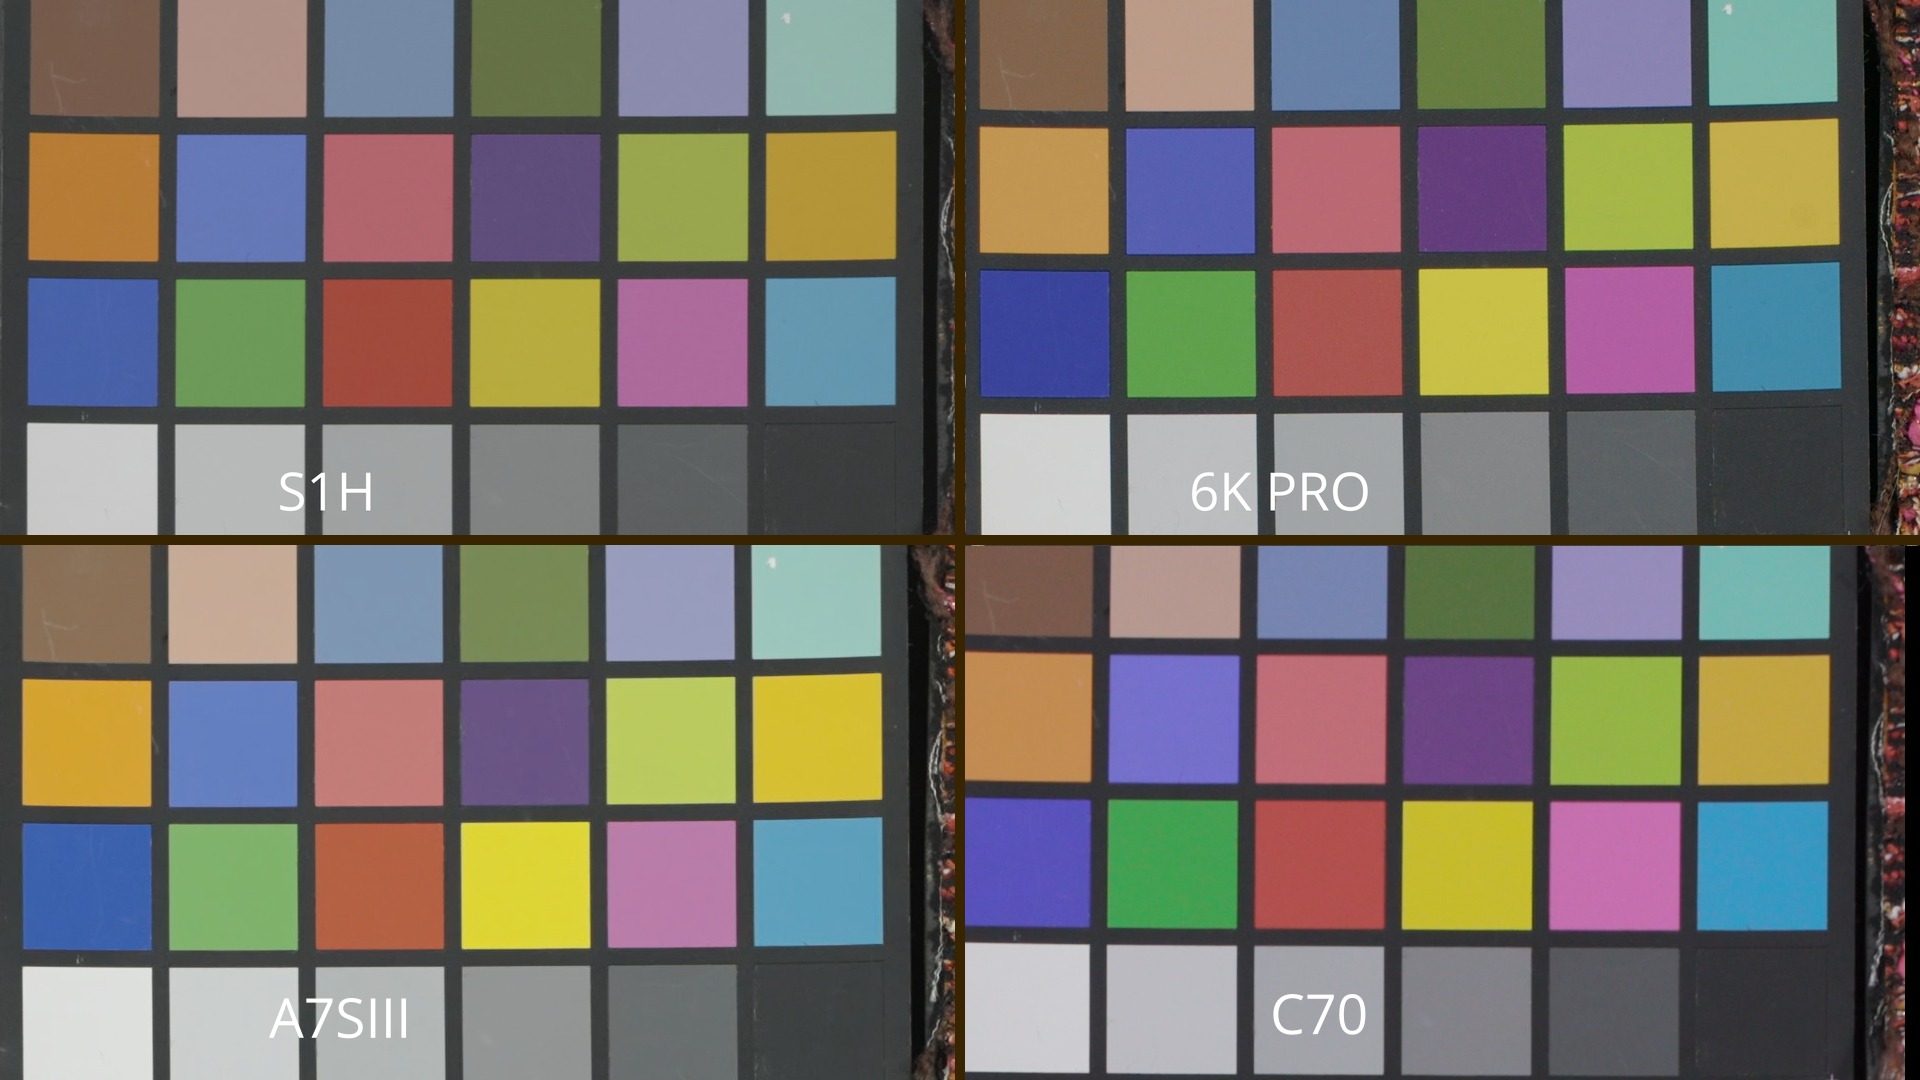 6K PRO color comp PF_4.3.1.jpg